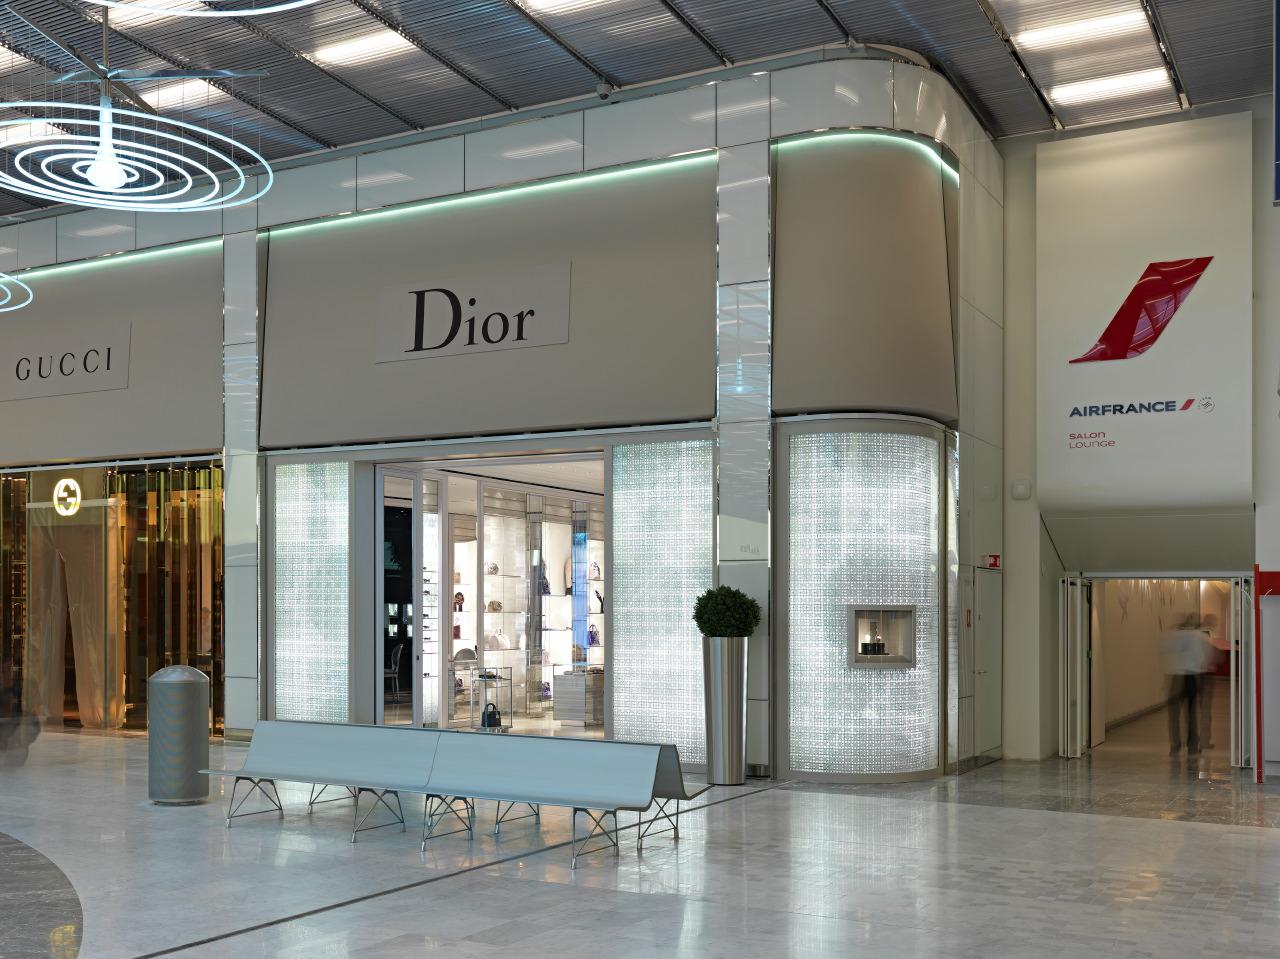 DIOR - PARIS CDG AIRPORT